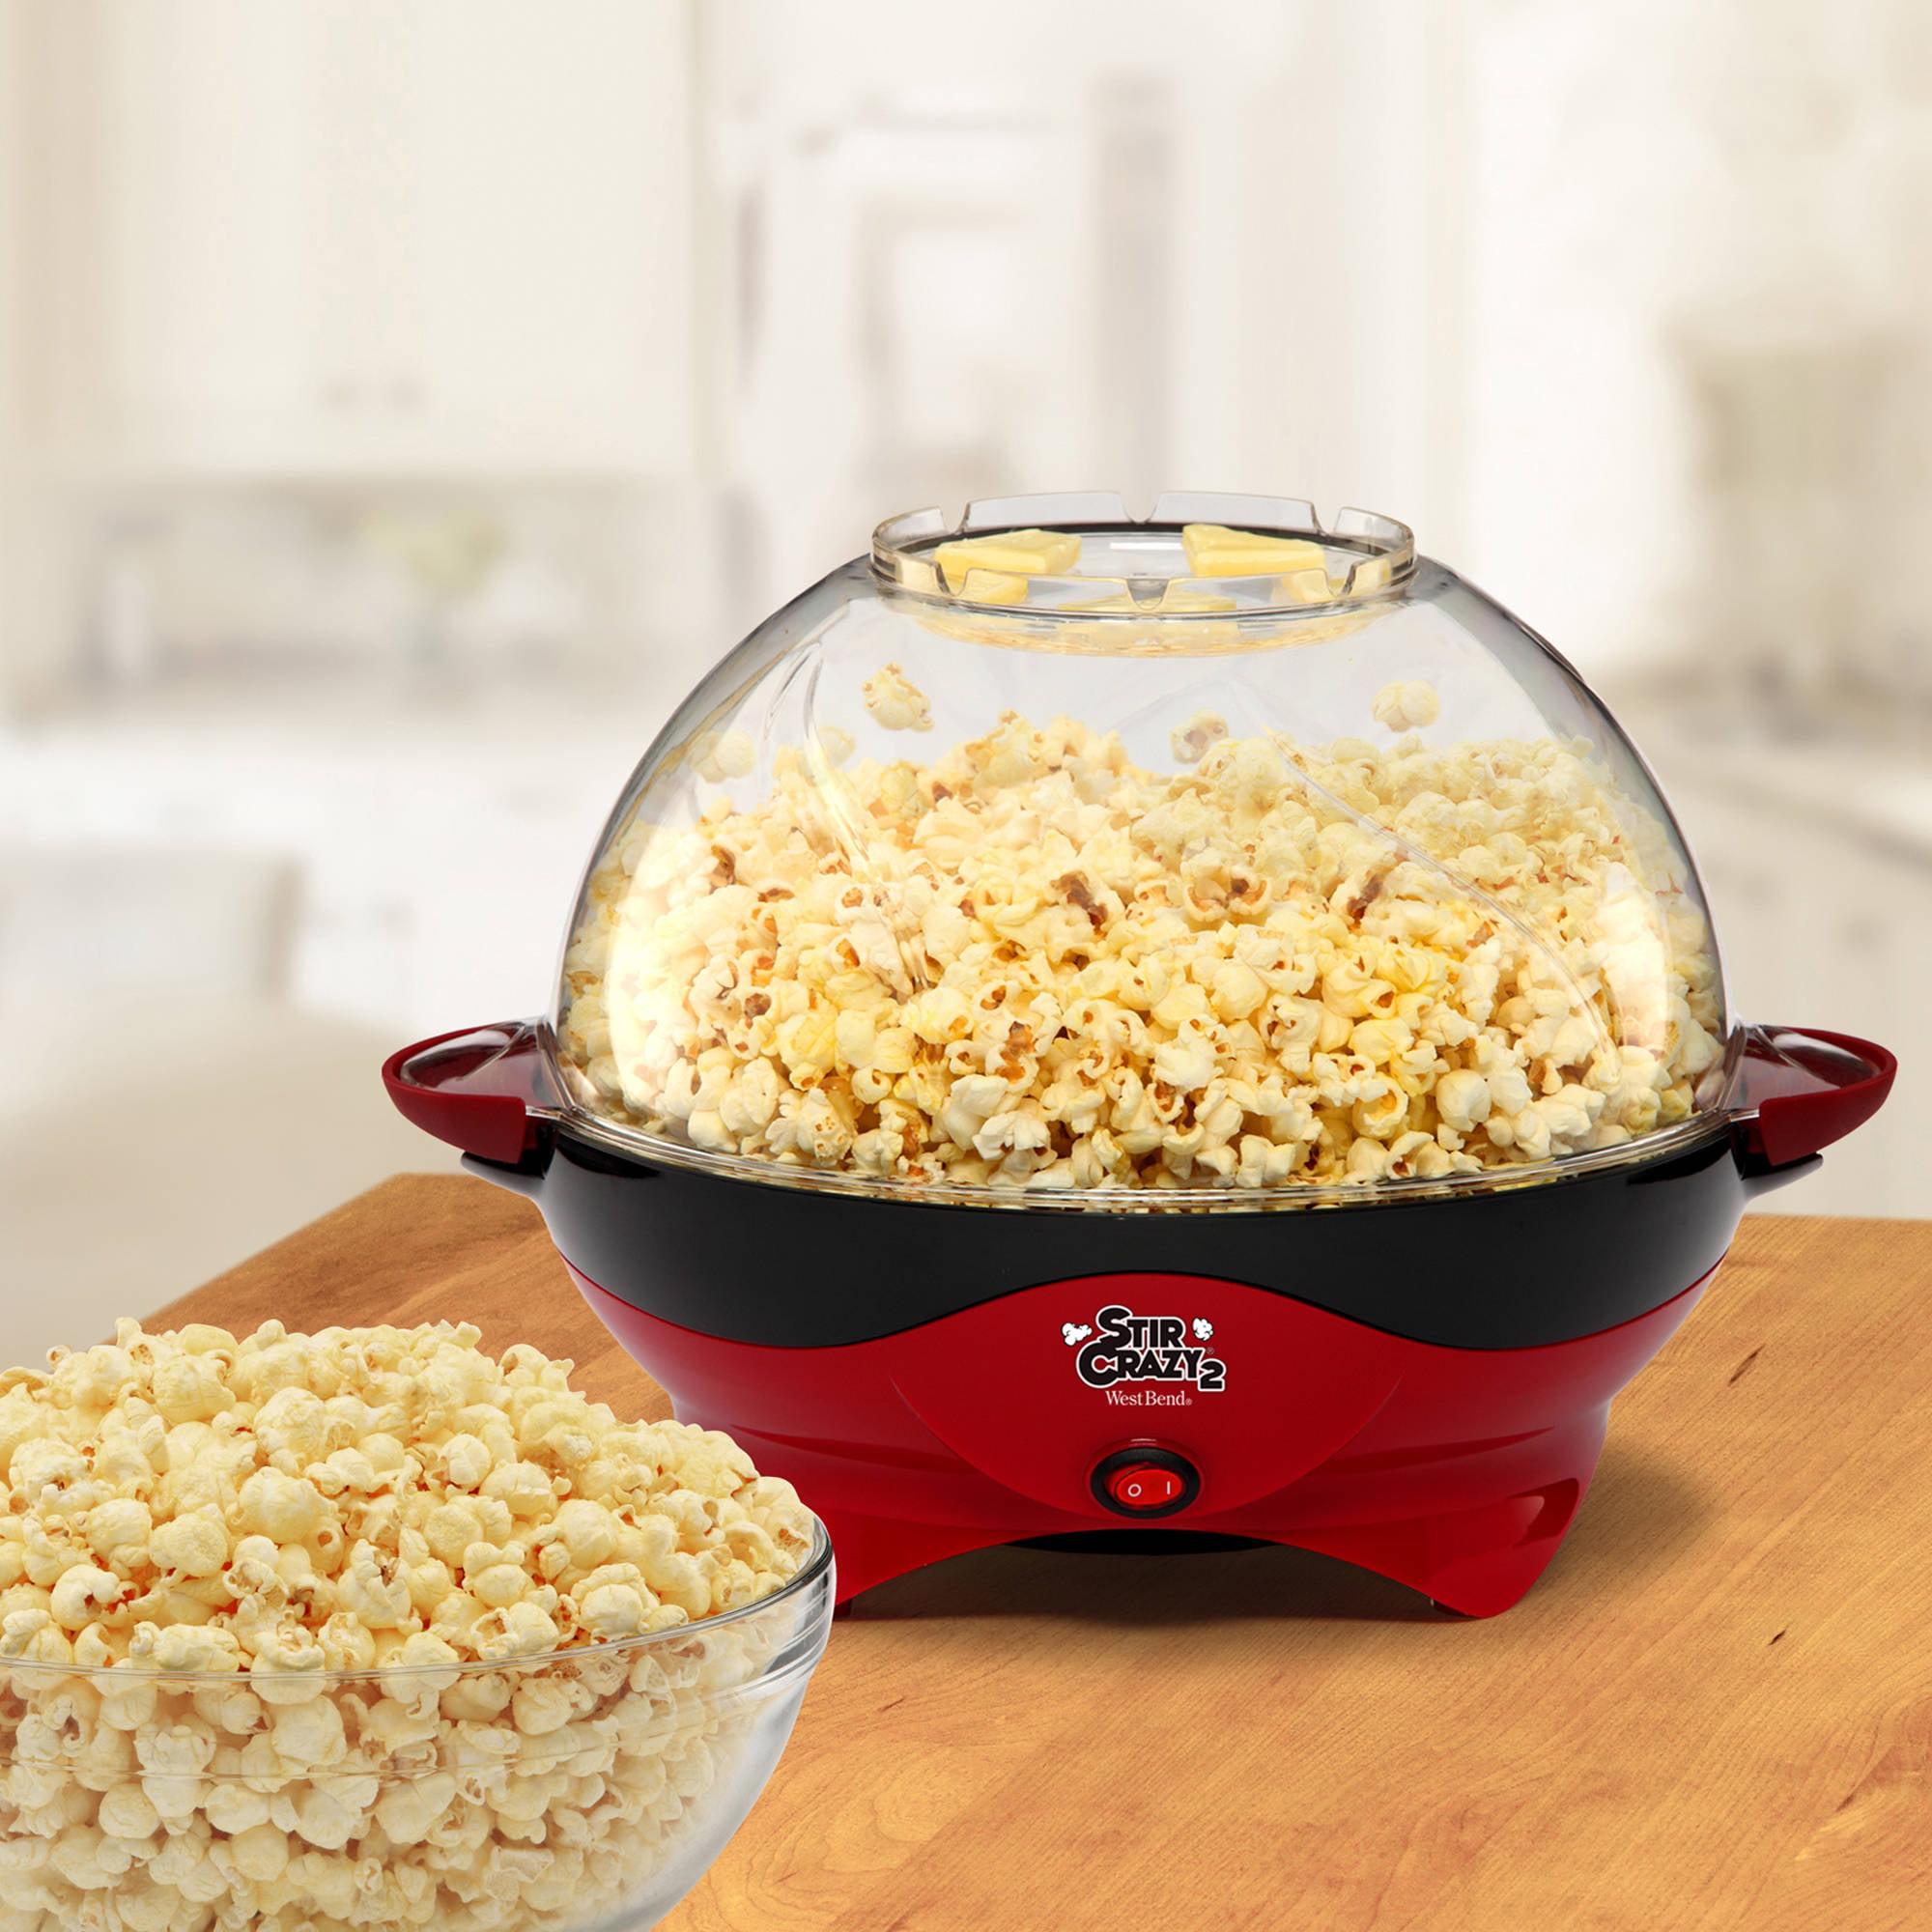 West Bend Stir Crazy Deluxe Popcorn Popper Red Walmart